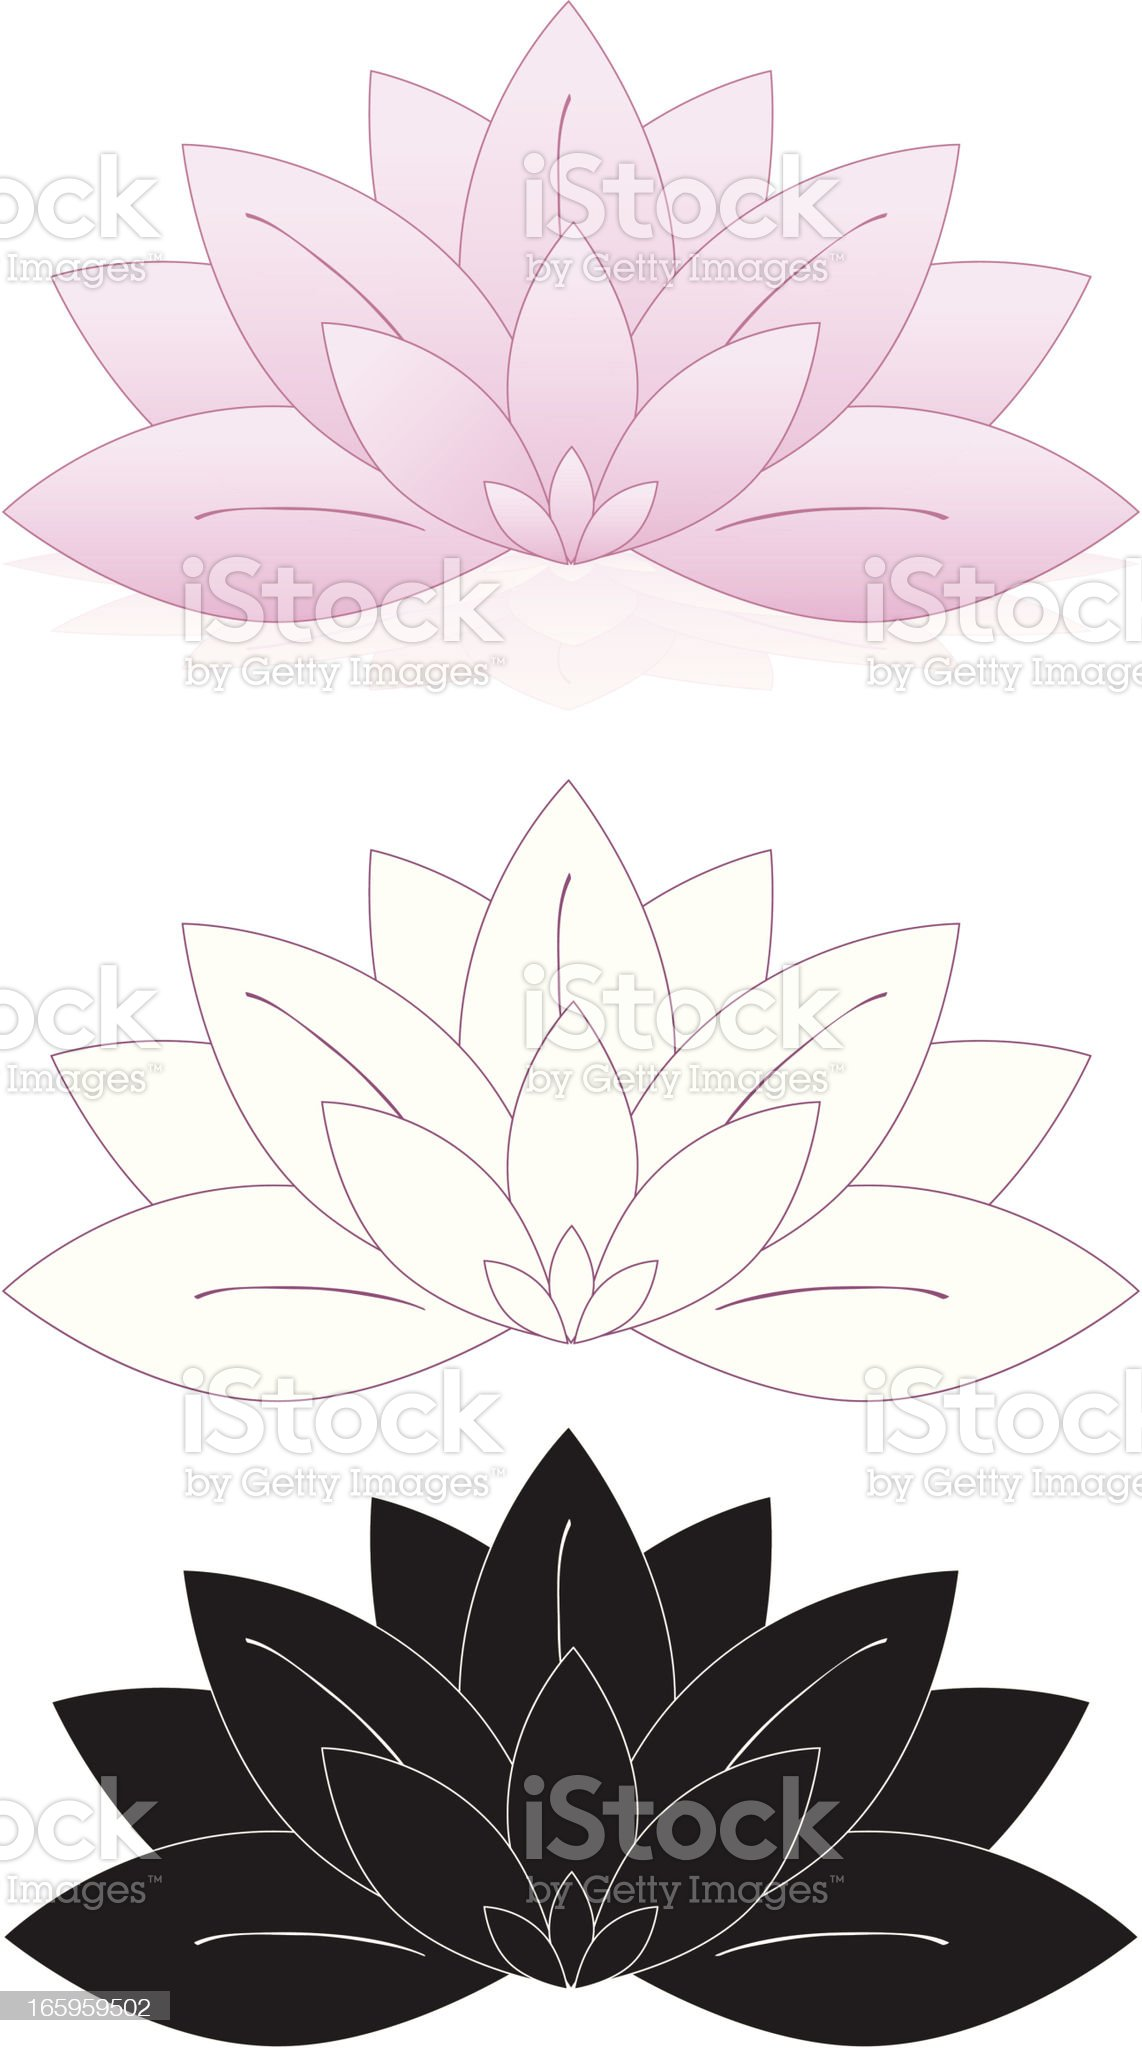 Lotus Flowers, Water Lilies Set (Pink, White, Black) royalty-free stock vector art